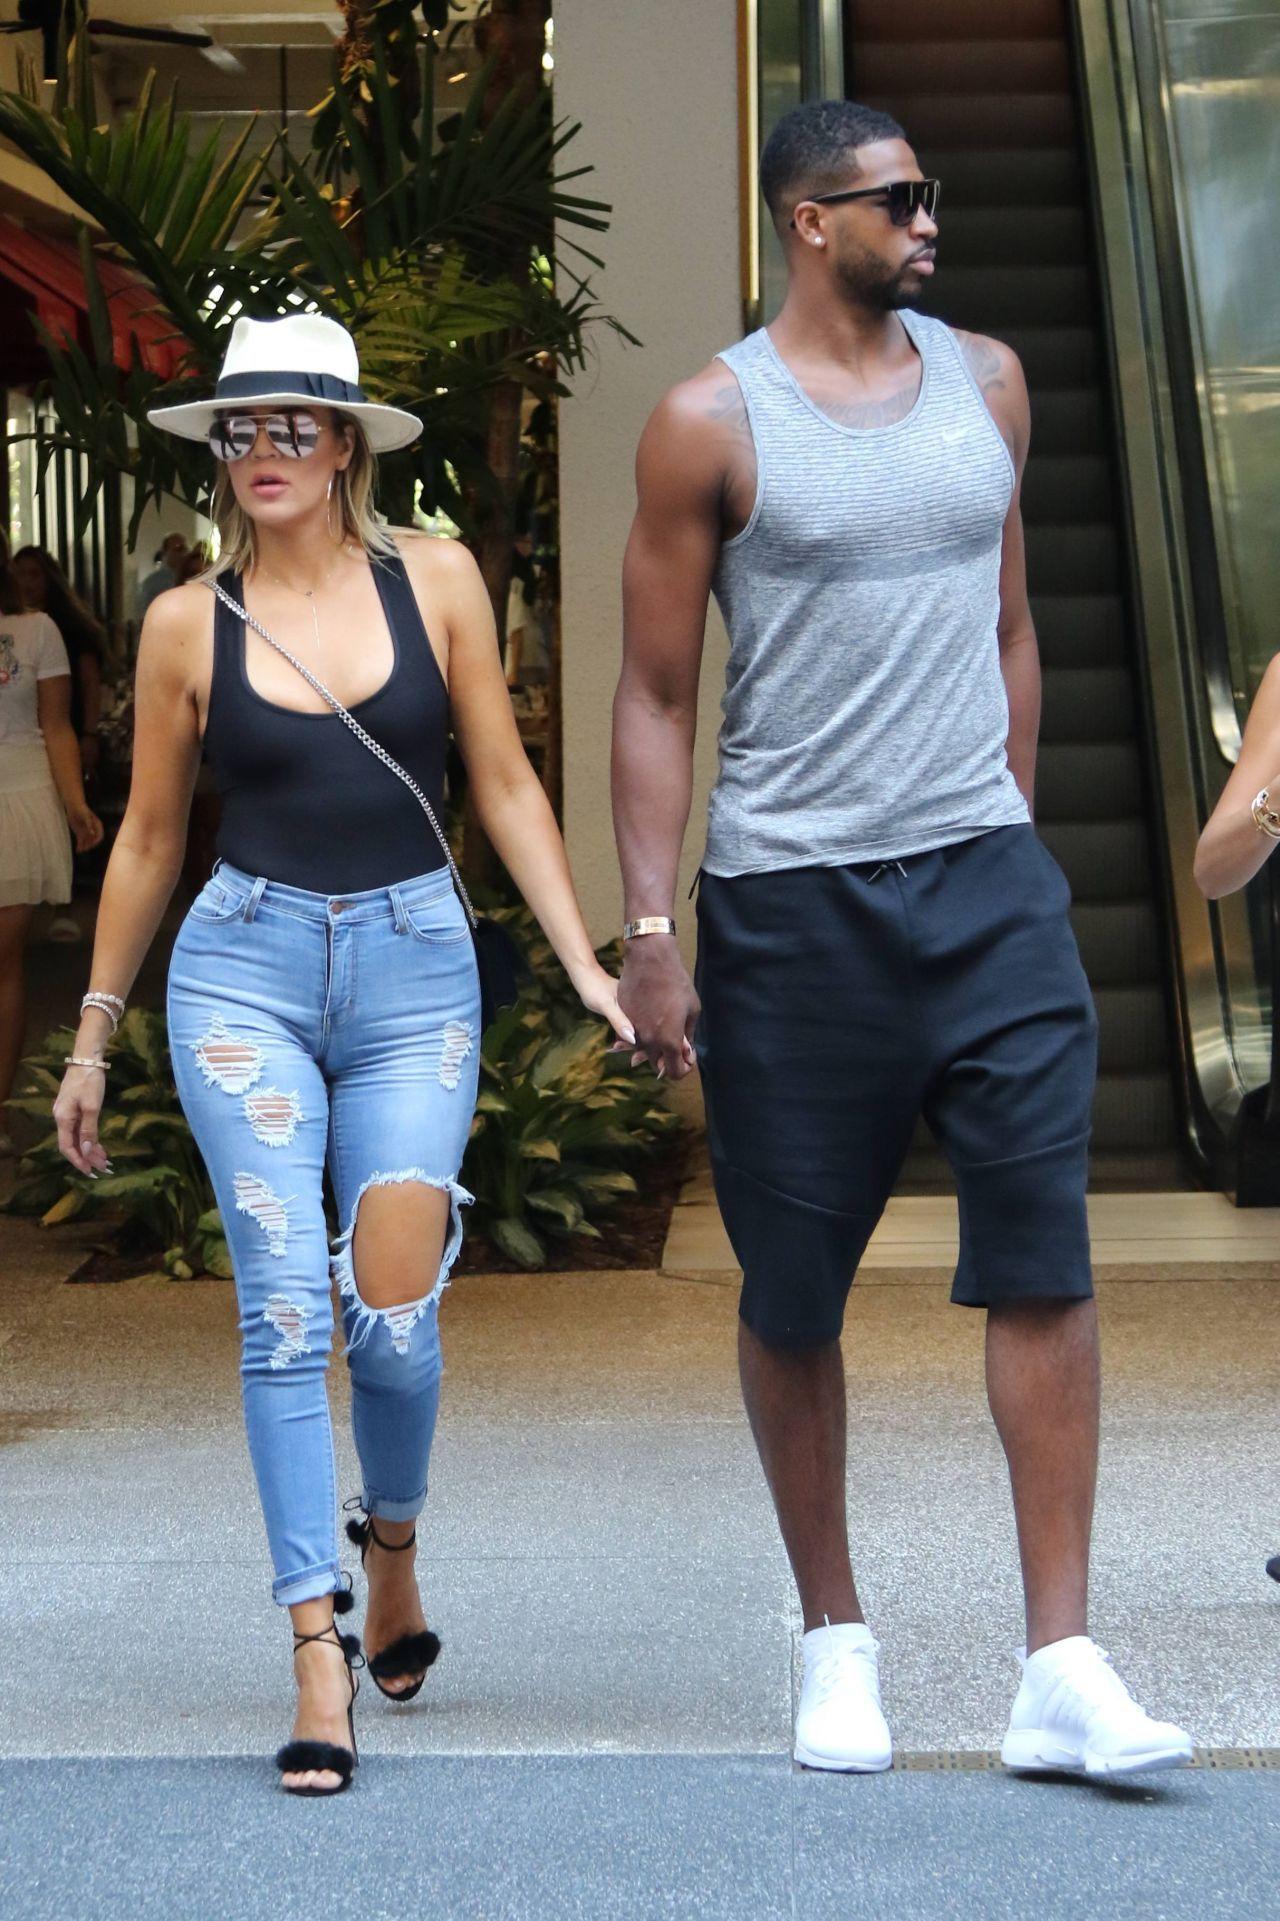 96298ddebc Kim Kardashian North West and Khole Kardashian Out in Miami Beach Sep-2016  Celebstills K Khloe Kardashian Kim Kardashian